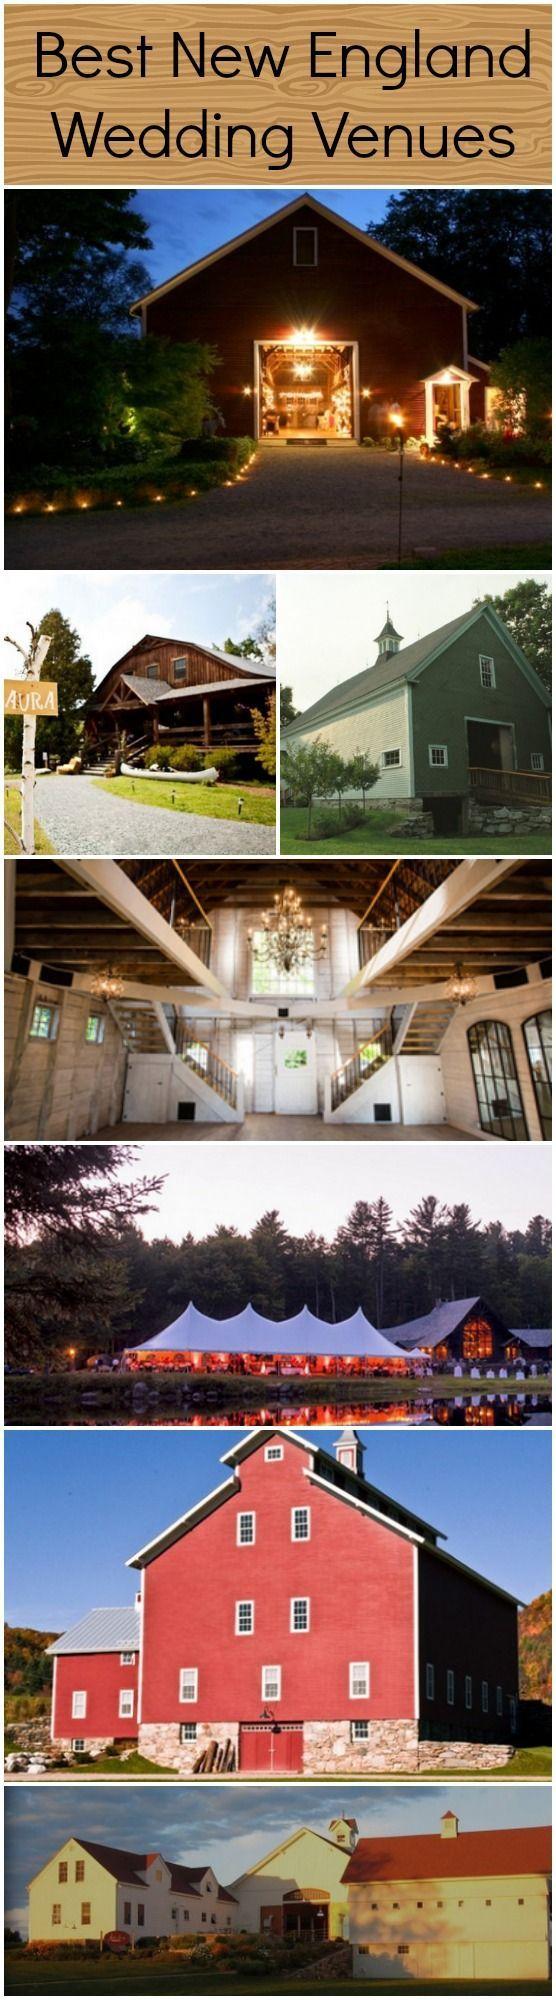 The Top 10 Best Wedding Venues In New England www.rusticweddingchic.com